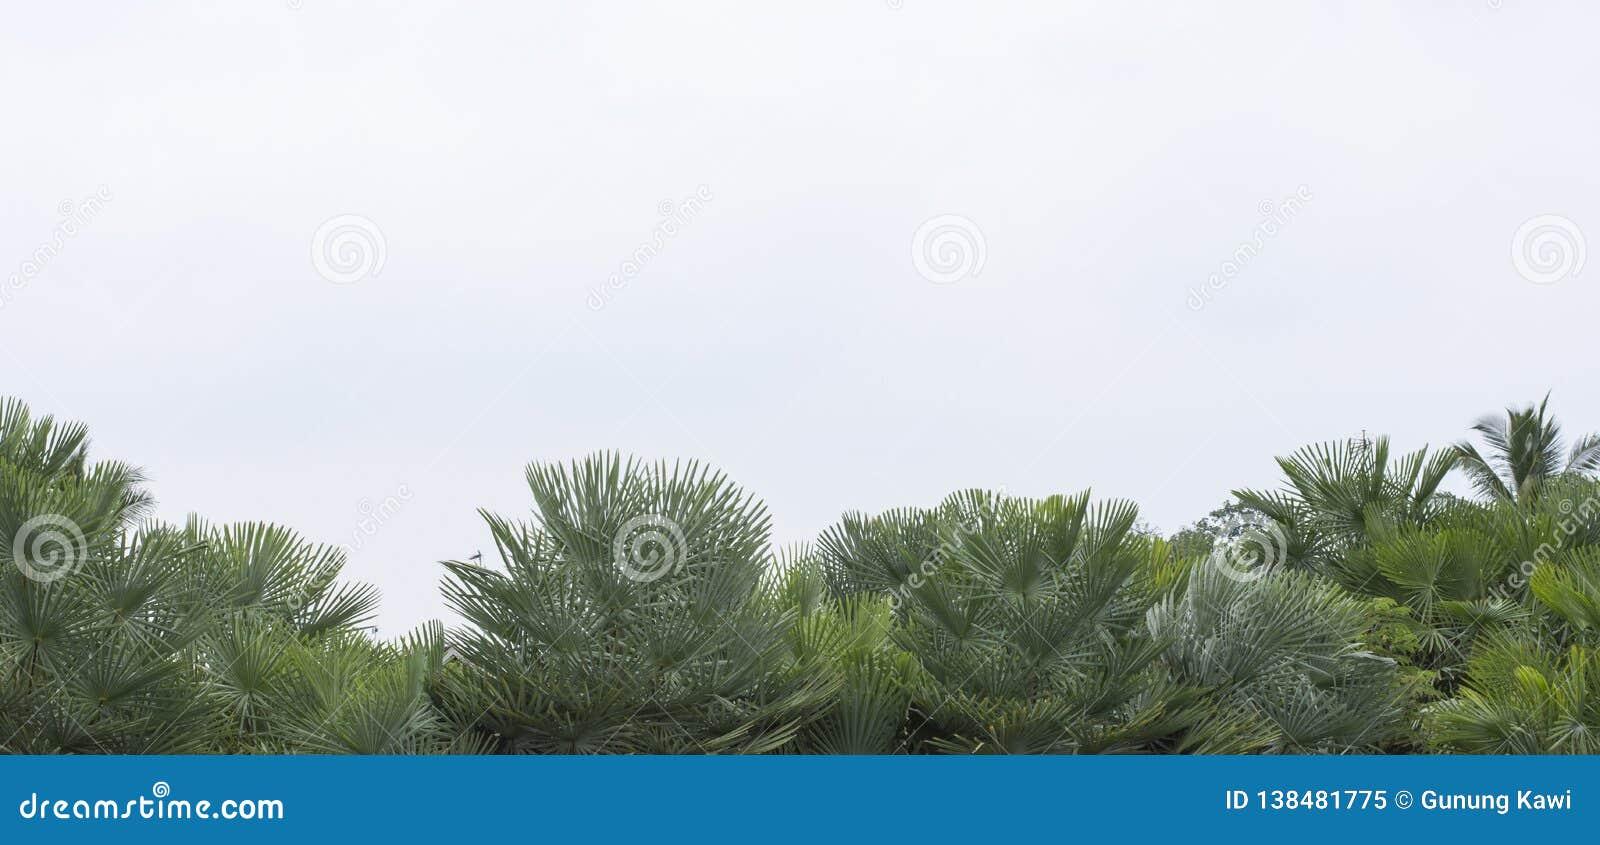 Latar-belakang tropis musim panas Yang-hijau dengan daun Dan-tanaman palem Yang-eksotis